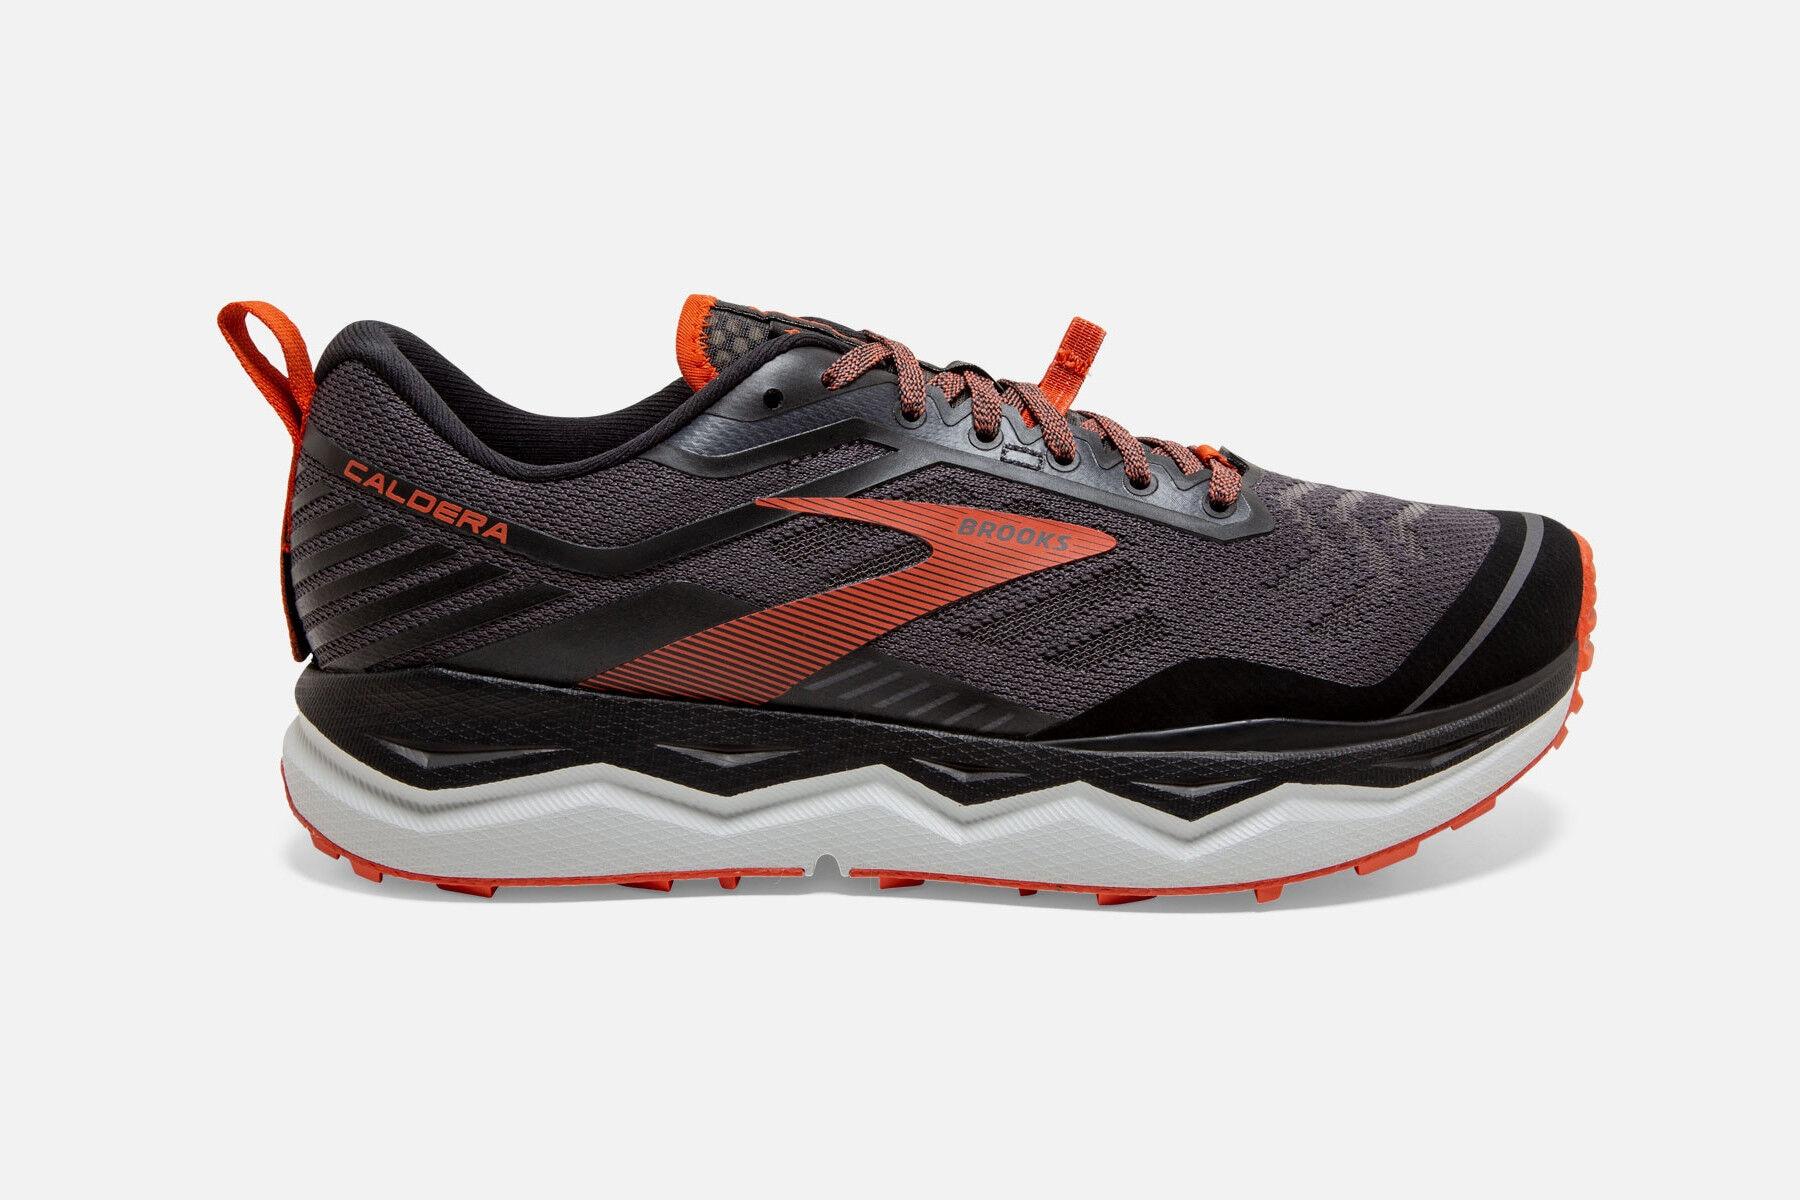 Caldera 4 | Men's Trail Shoes | Brooks